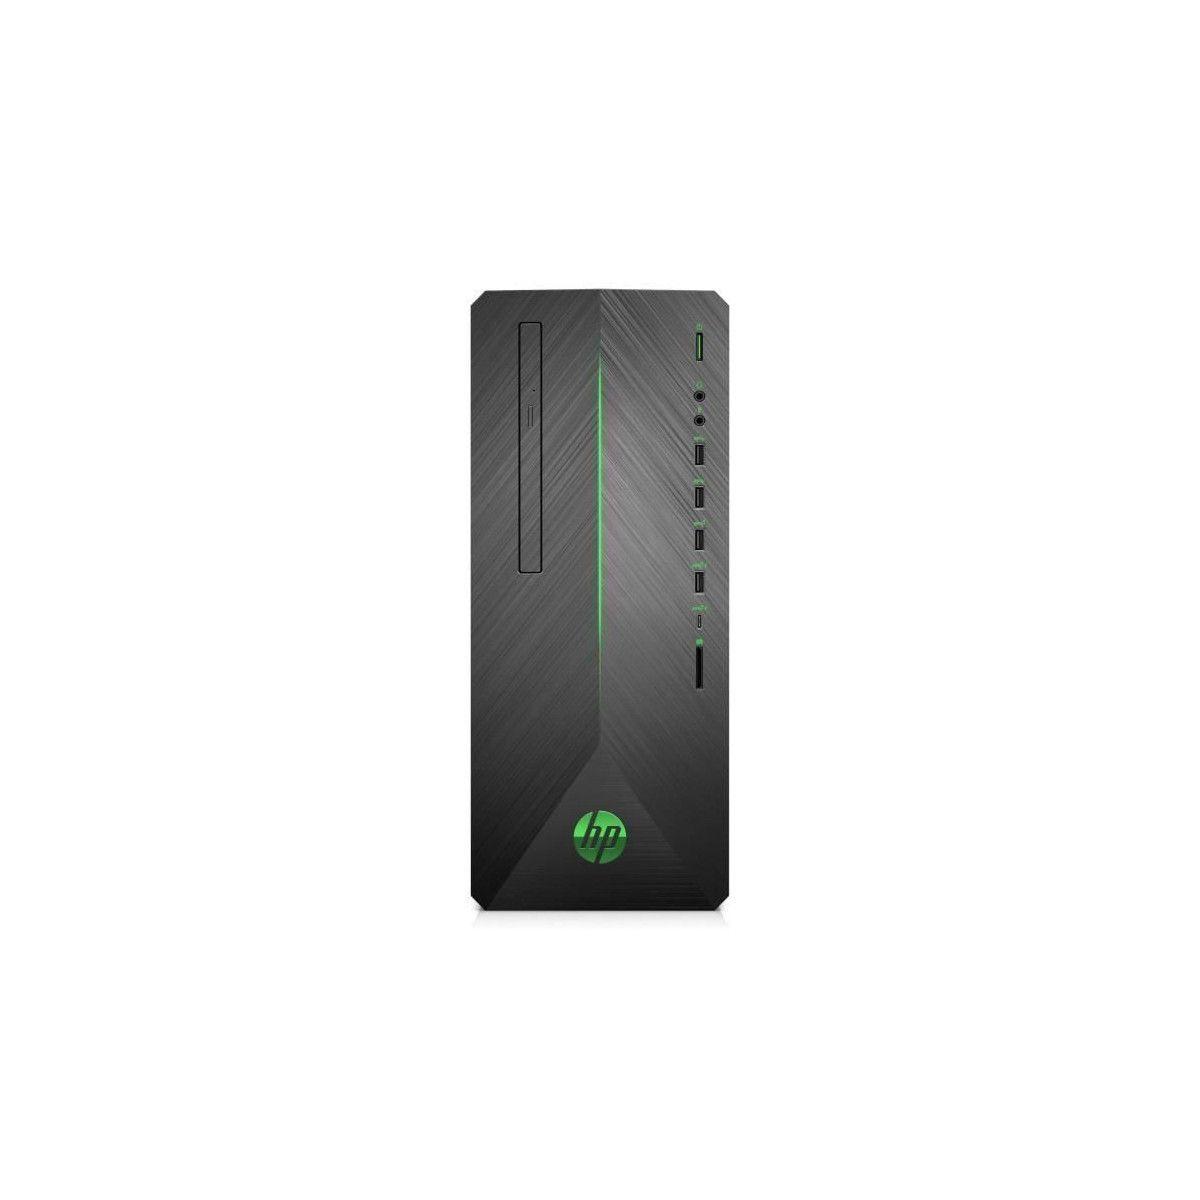 HP PC de Bureau Pavilion Gaming HP790-0021nf -Core i7-8700 - RAM